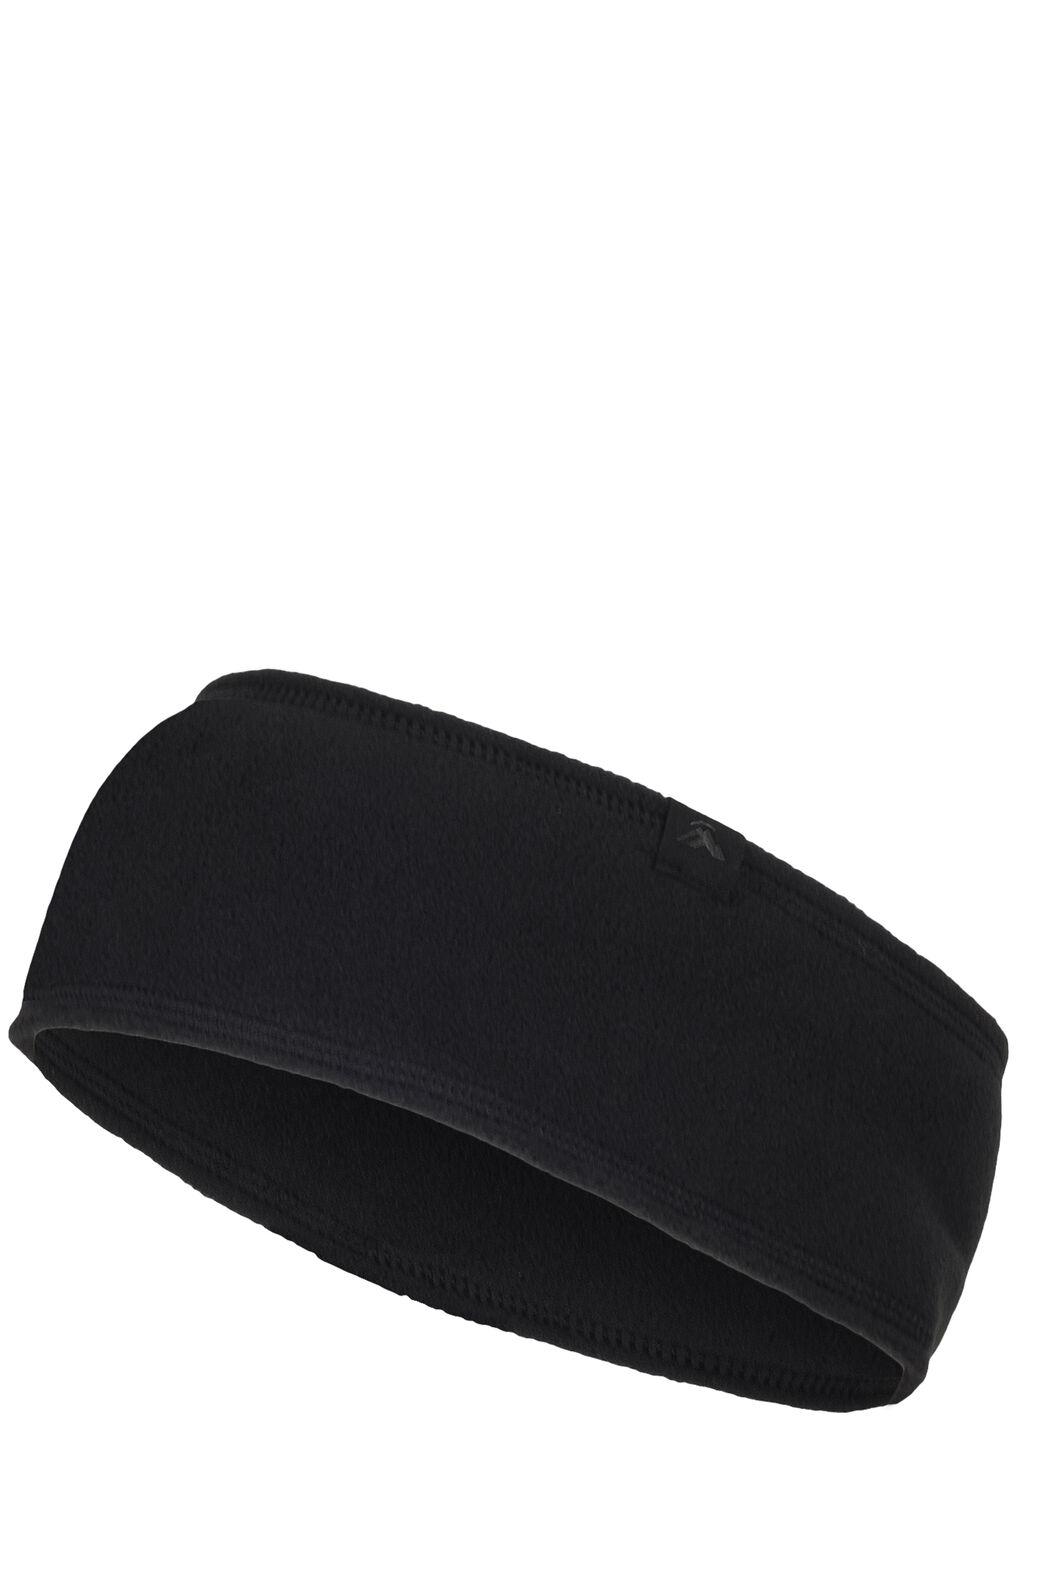 Macpac Tieke Headband, Black, hi-res